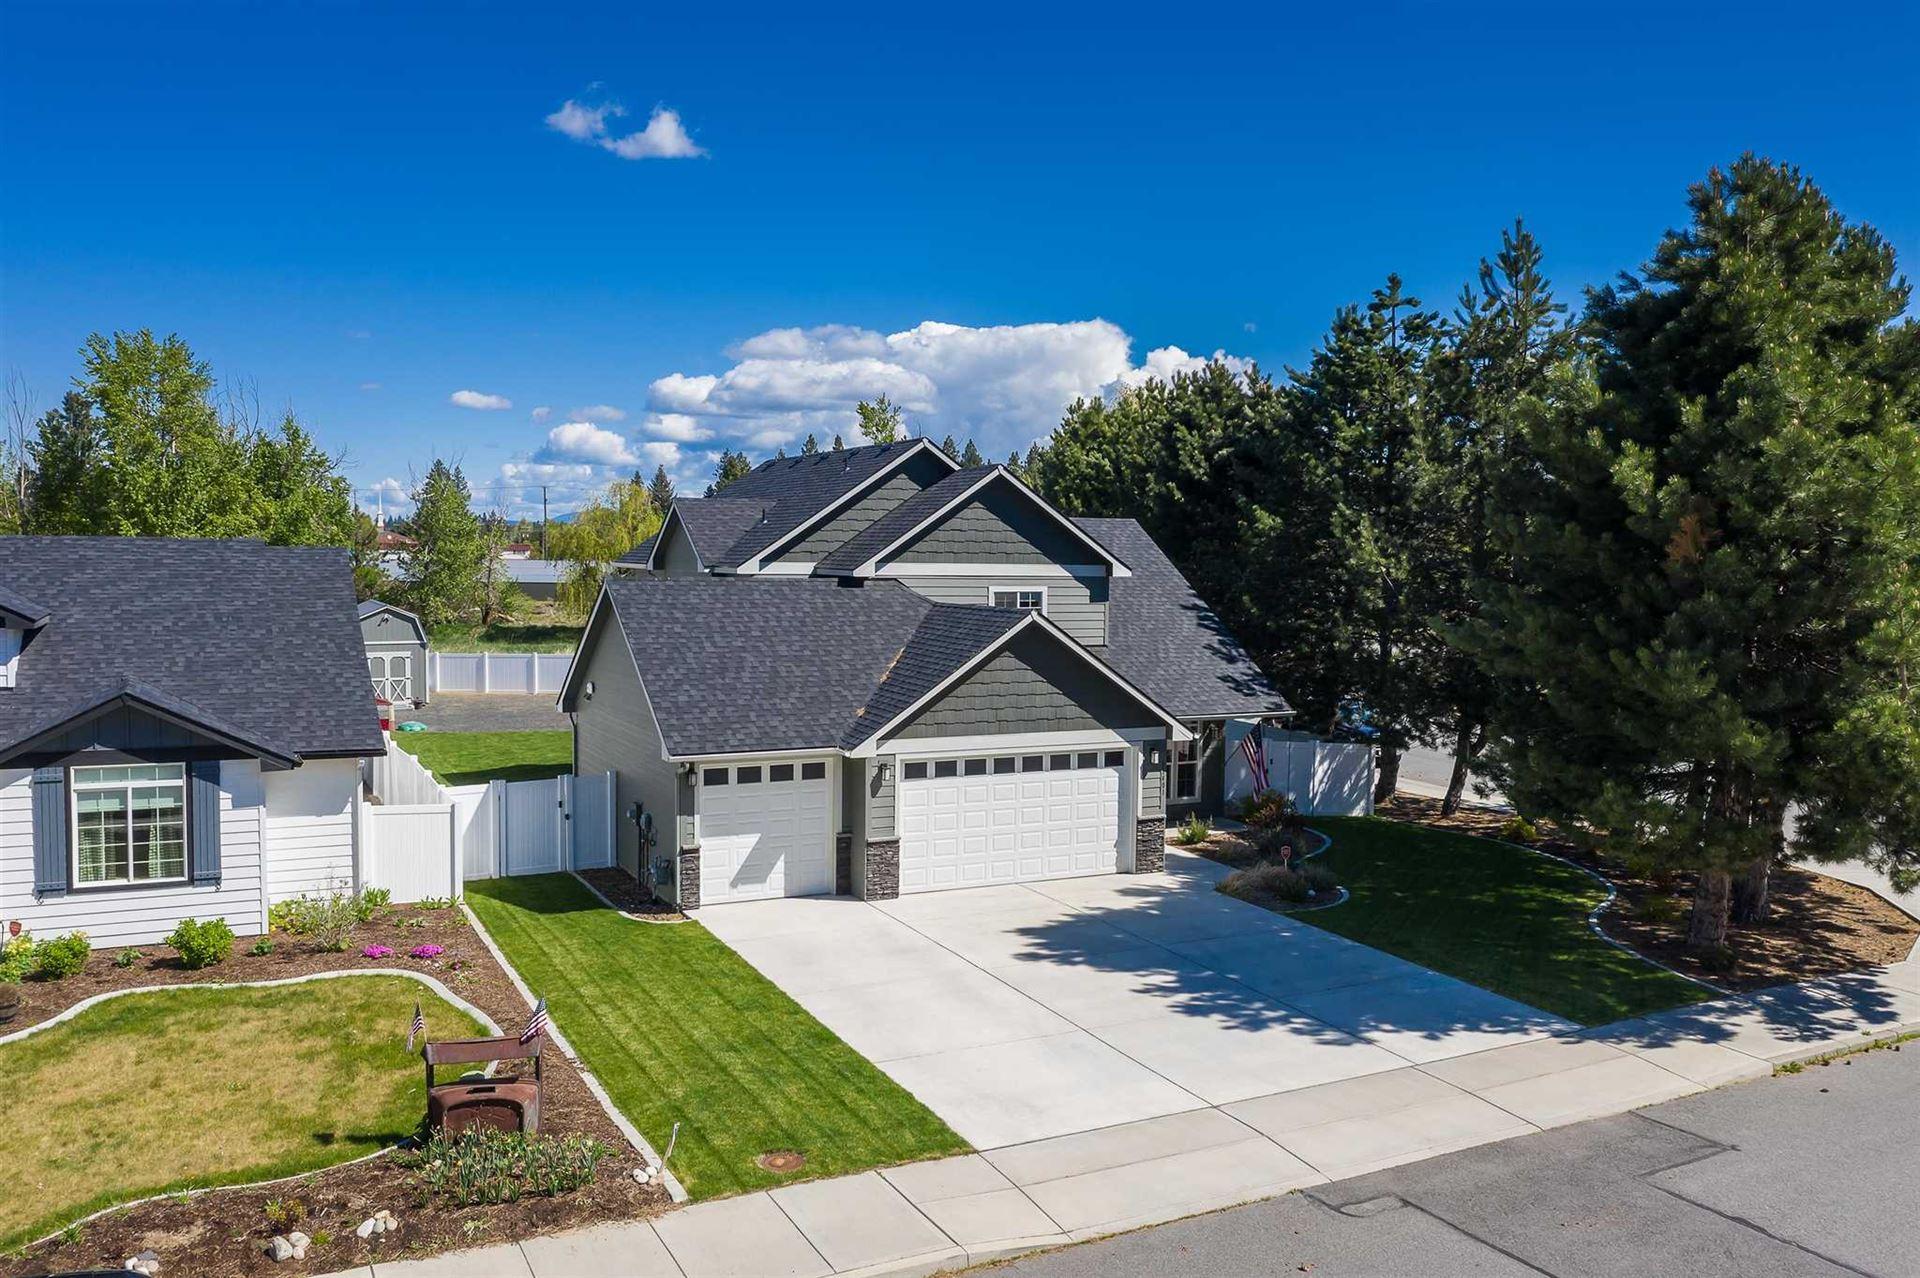 11401 E Sundown Dr, Spokane Valley, WA 99206 - #: 202115273